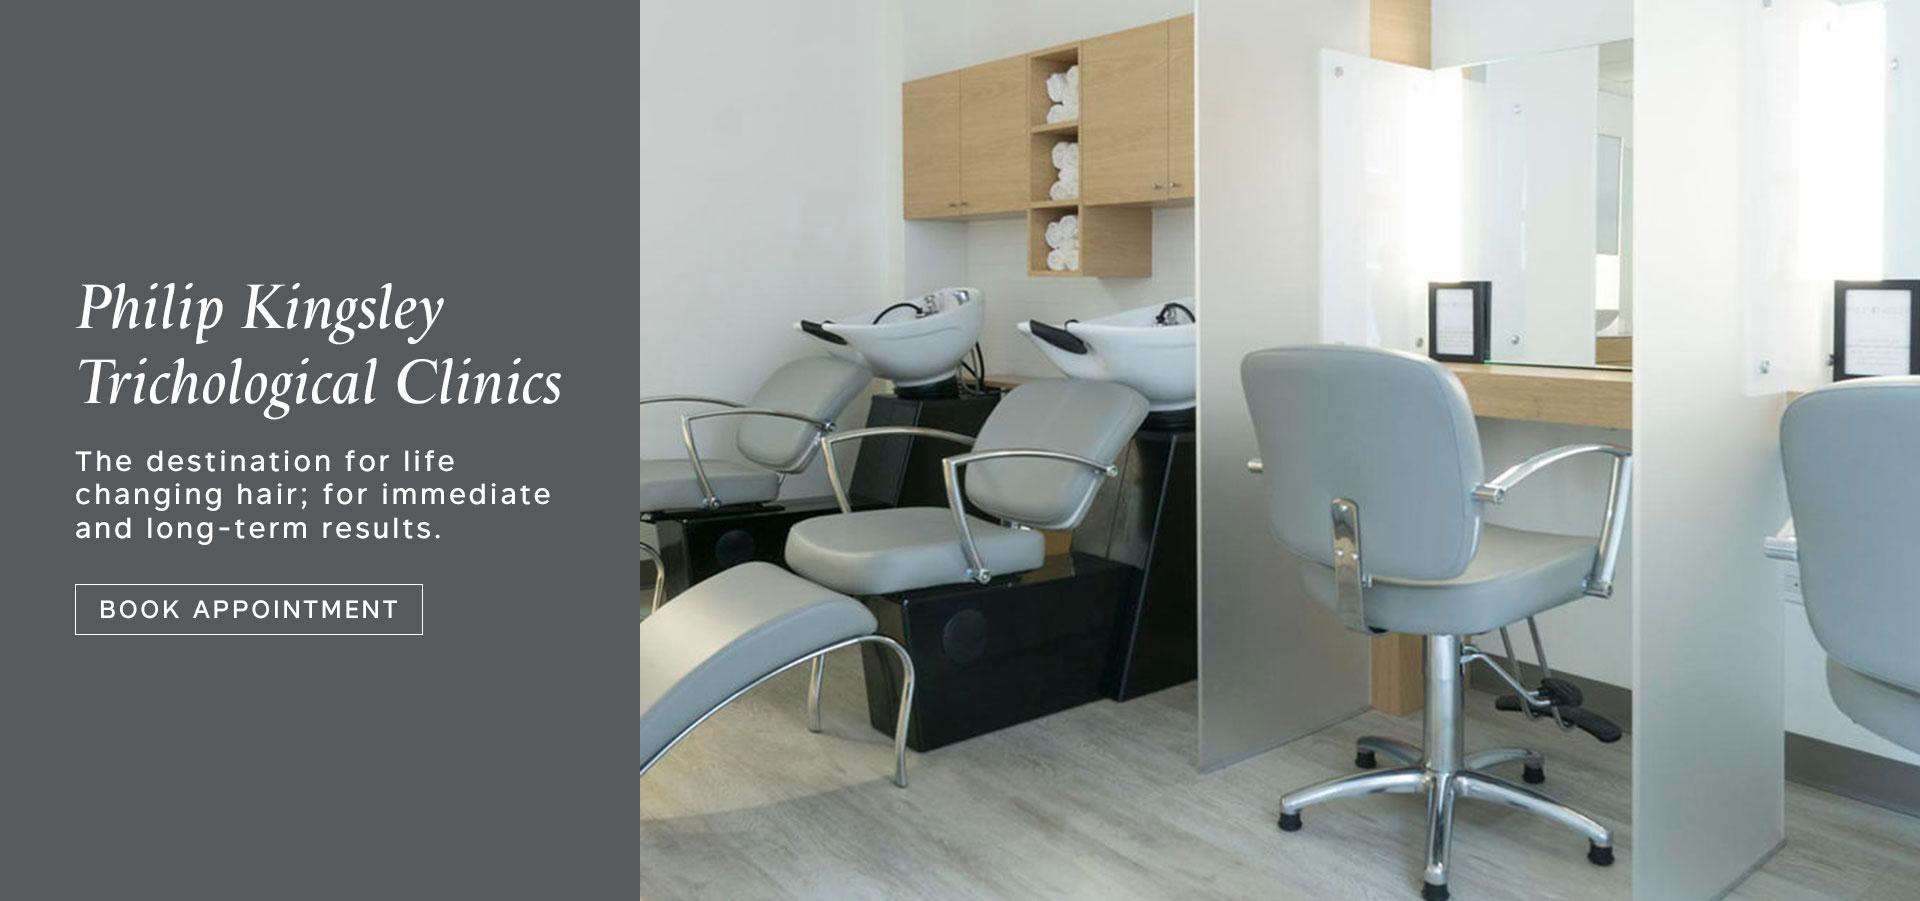 Philip Kingsley Trichological clinics, New York & London